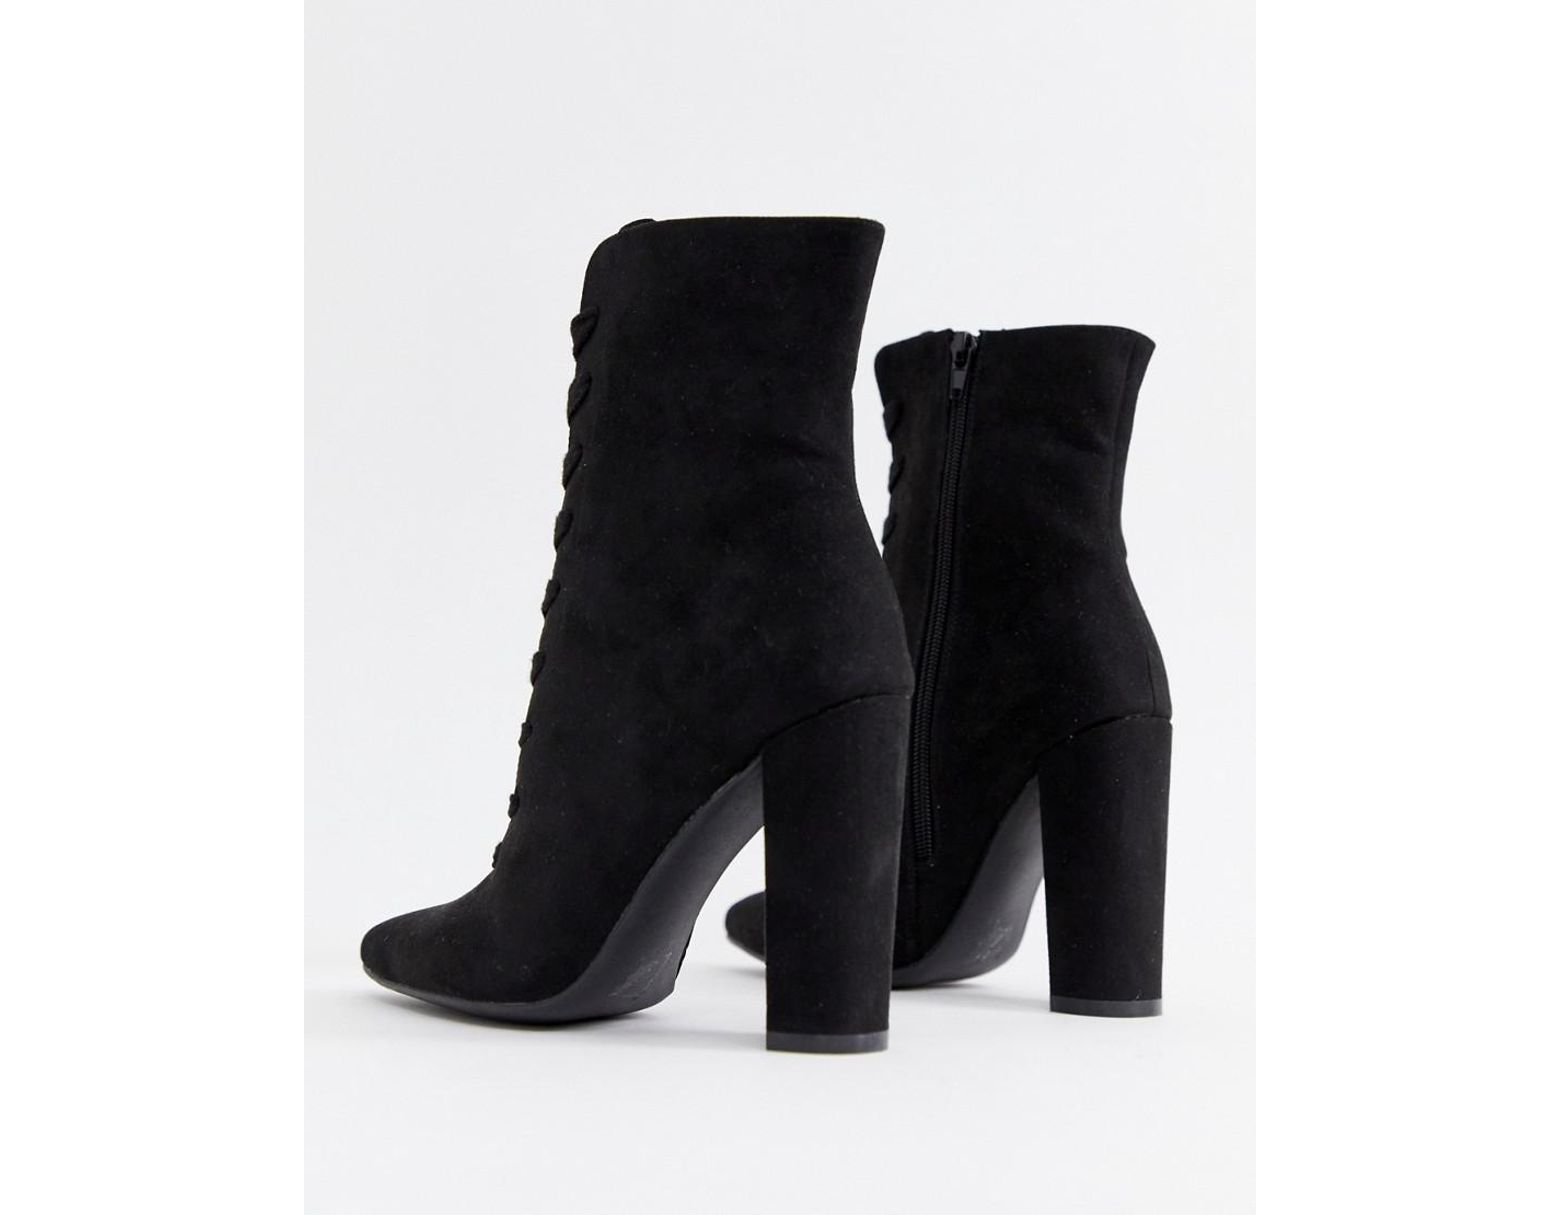 e0e0010d16c Women's Black Elicia Lace Up Heeled Boots